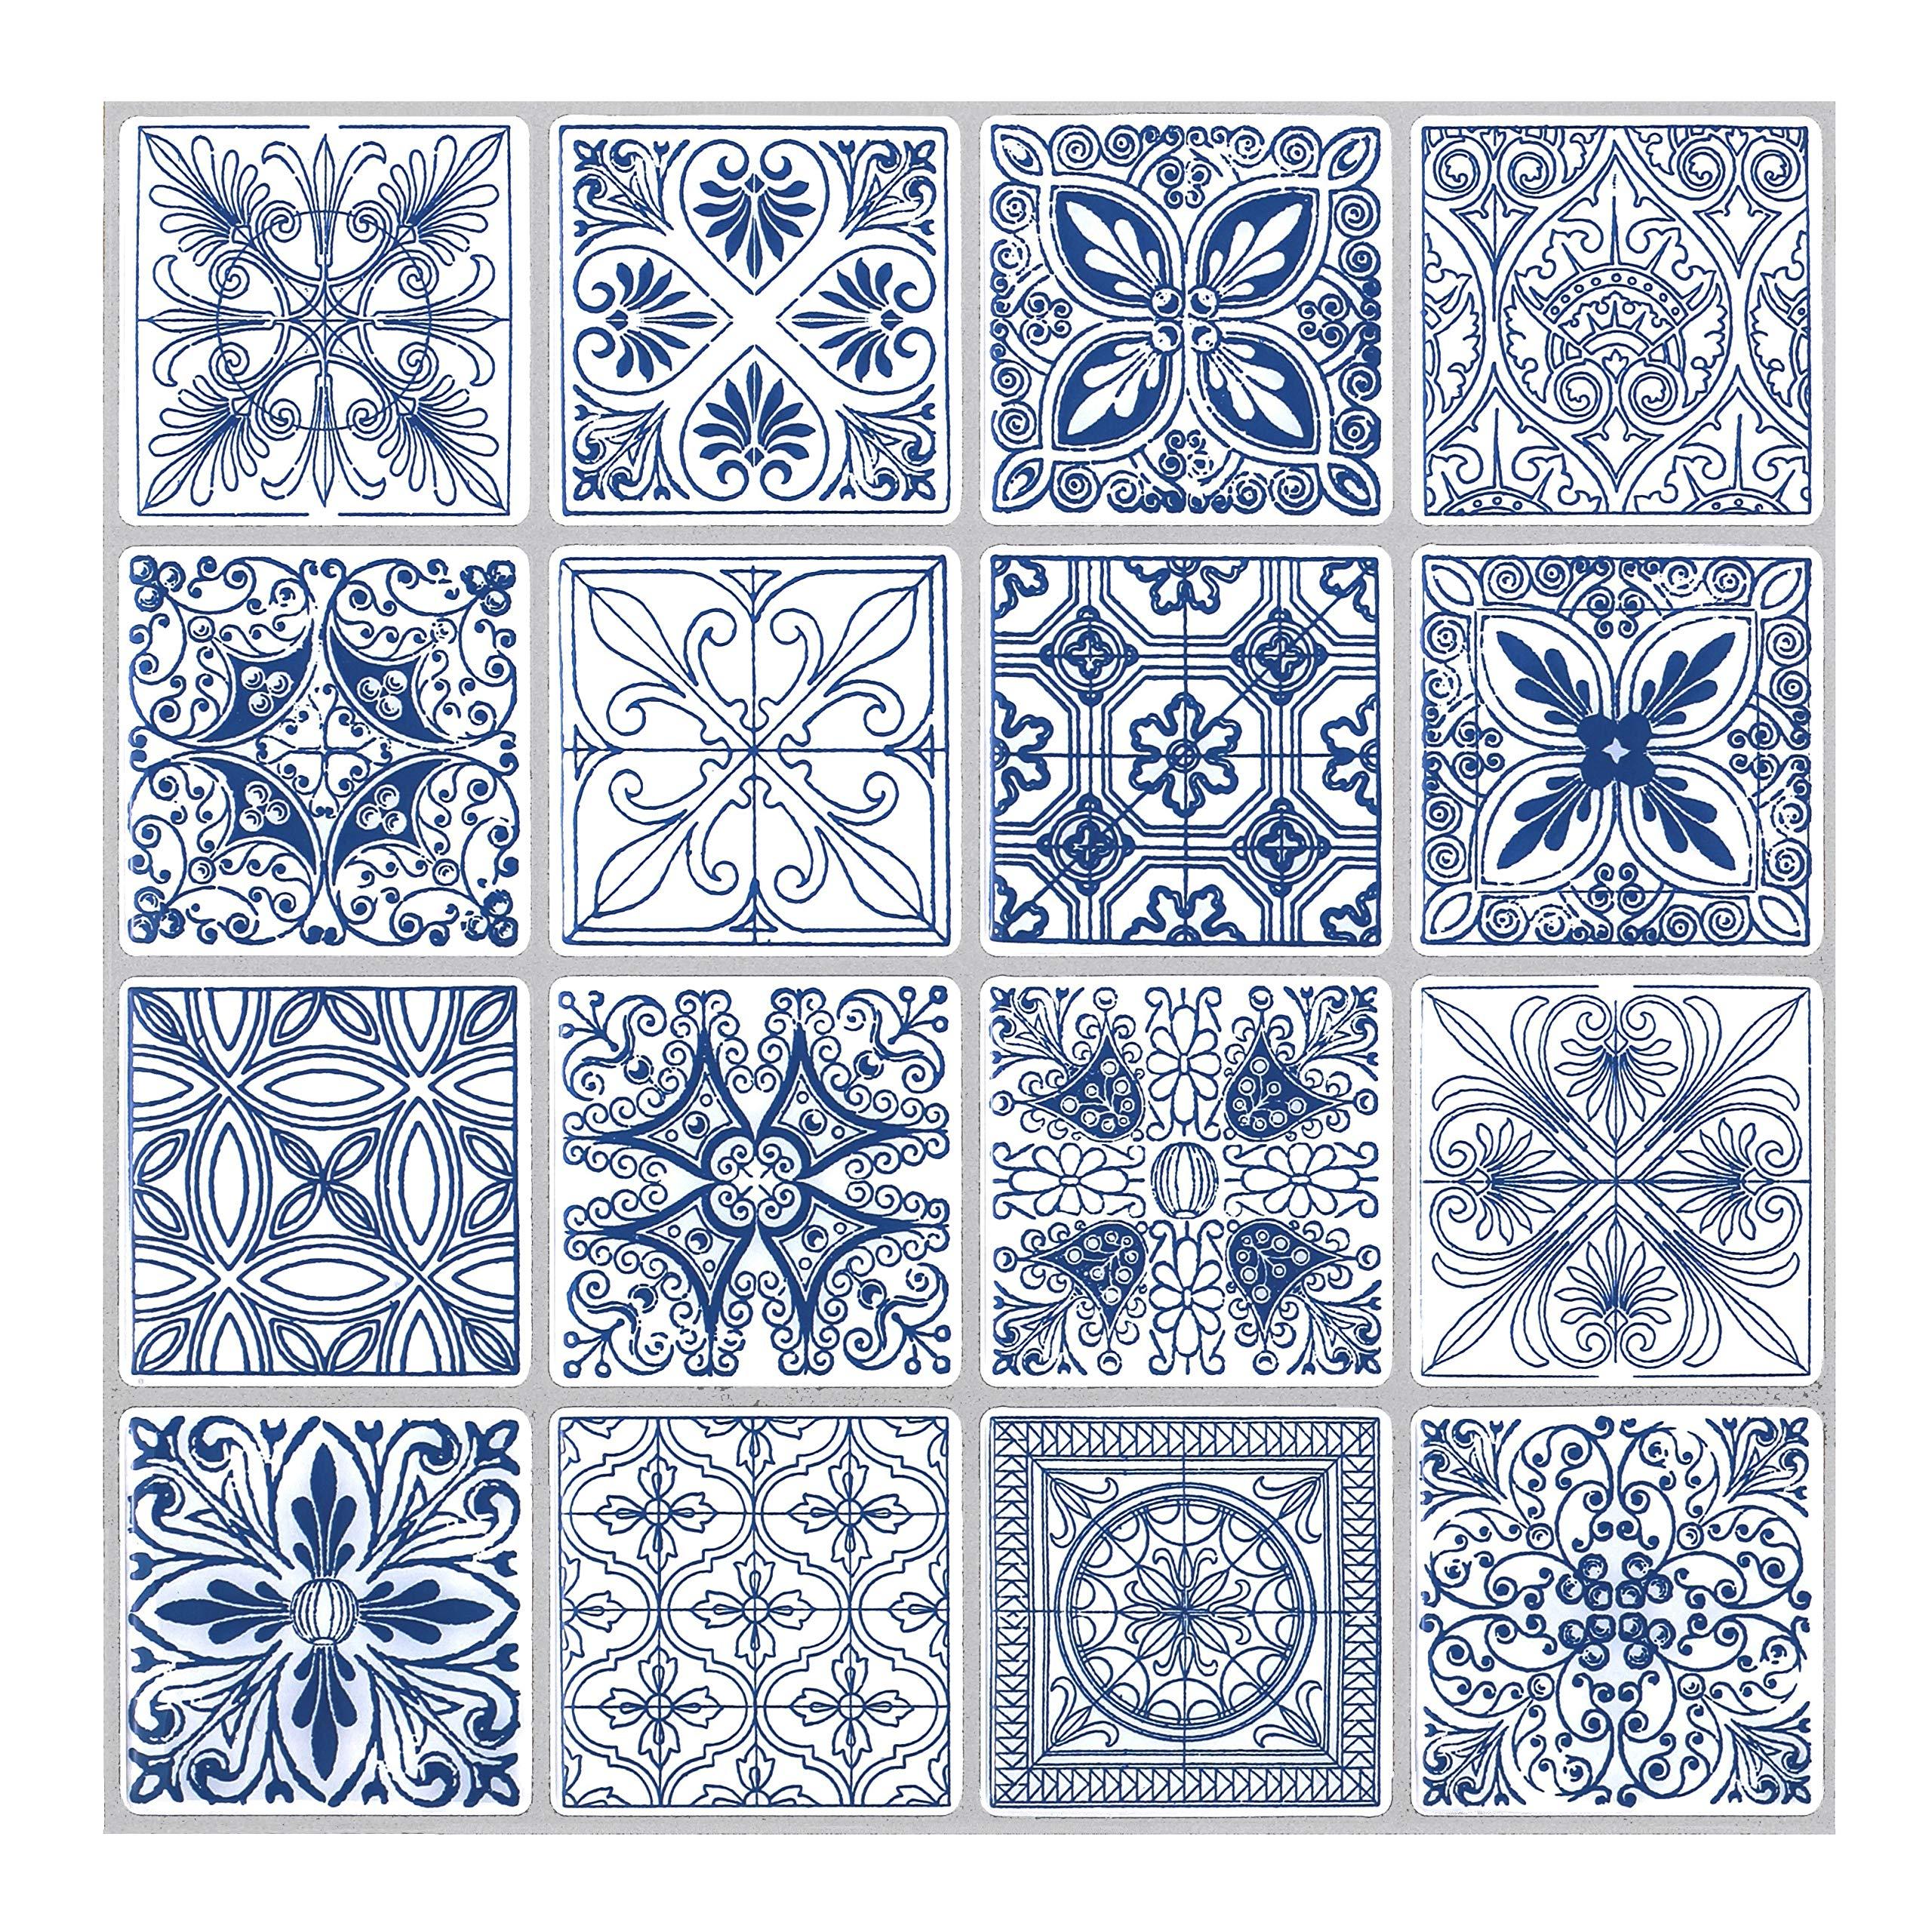 Tic Tac Tiles - Premium Anti Mold Peel and Stick Wall Tile Backsplash in Portuguese Blue (Portuguese Blue, 5)